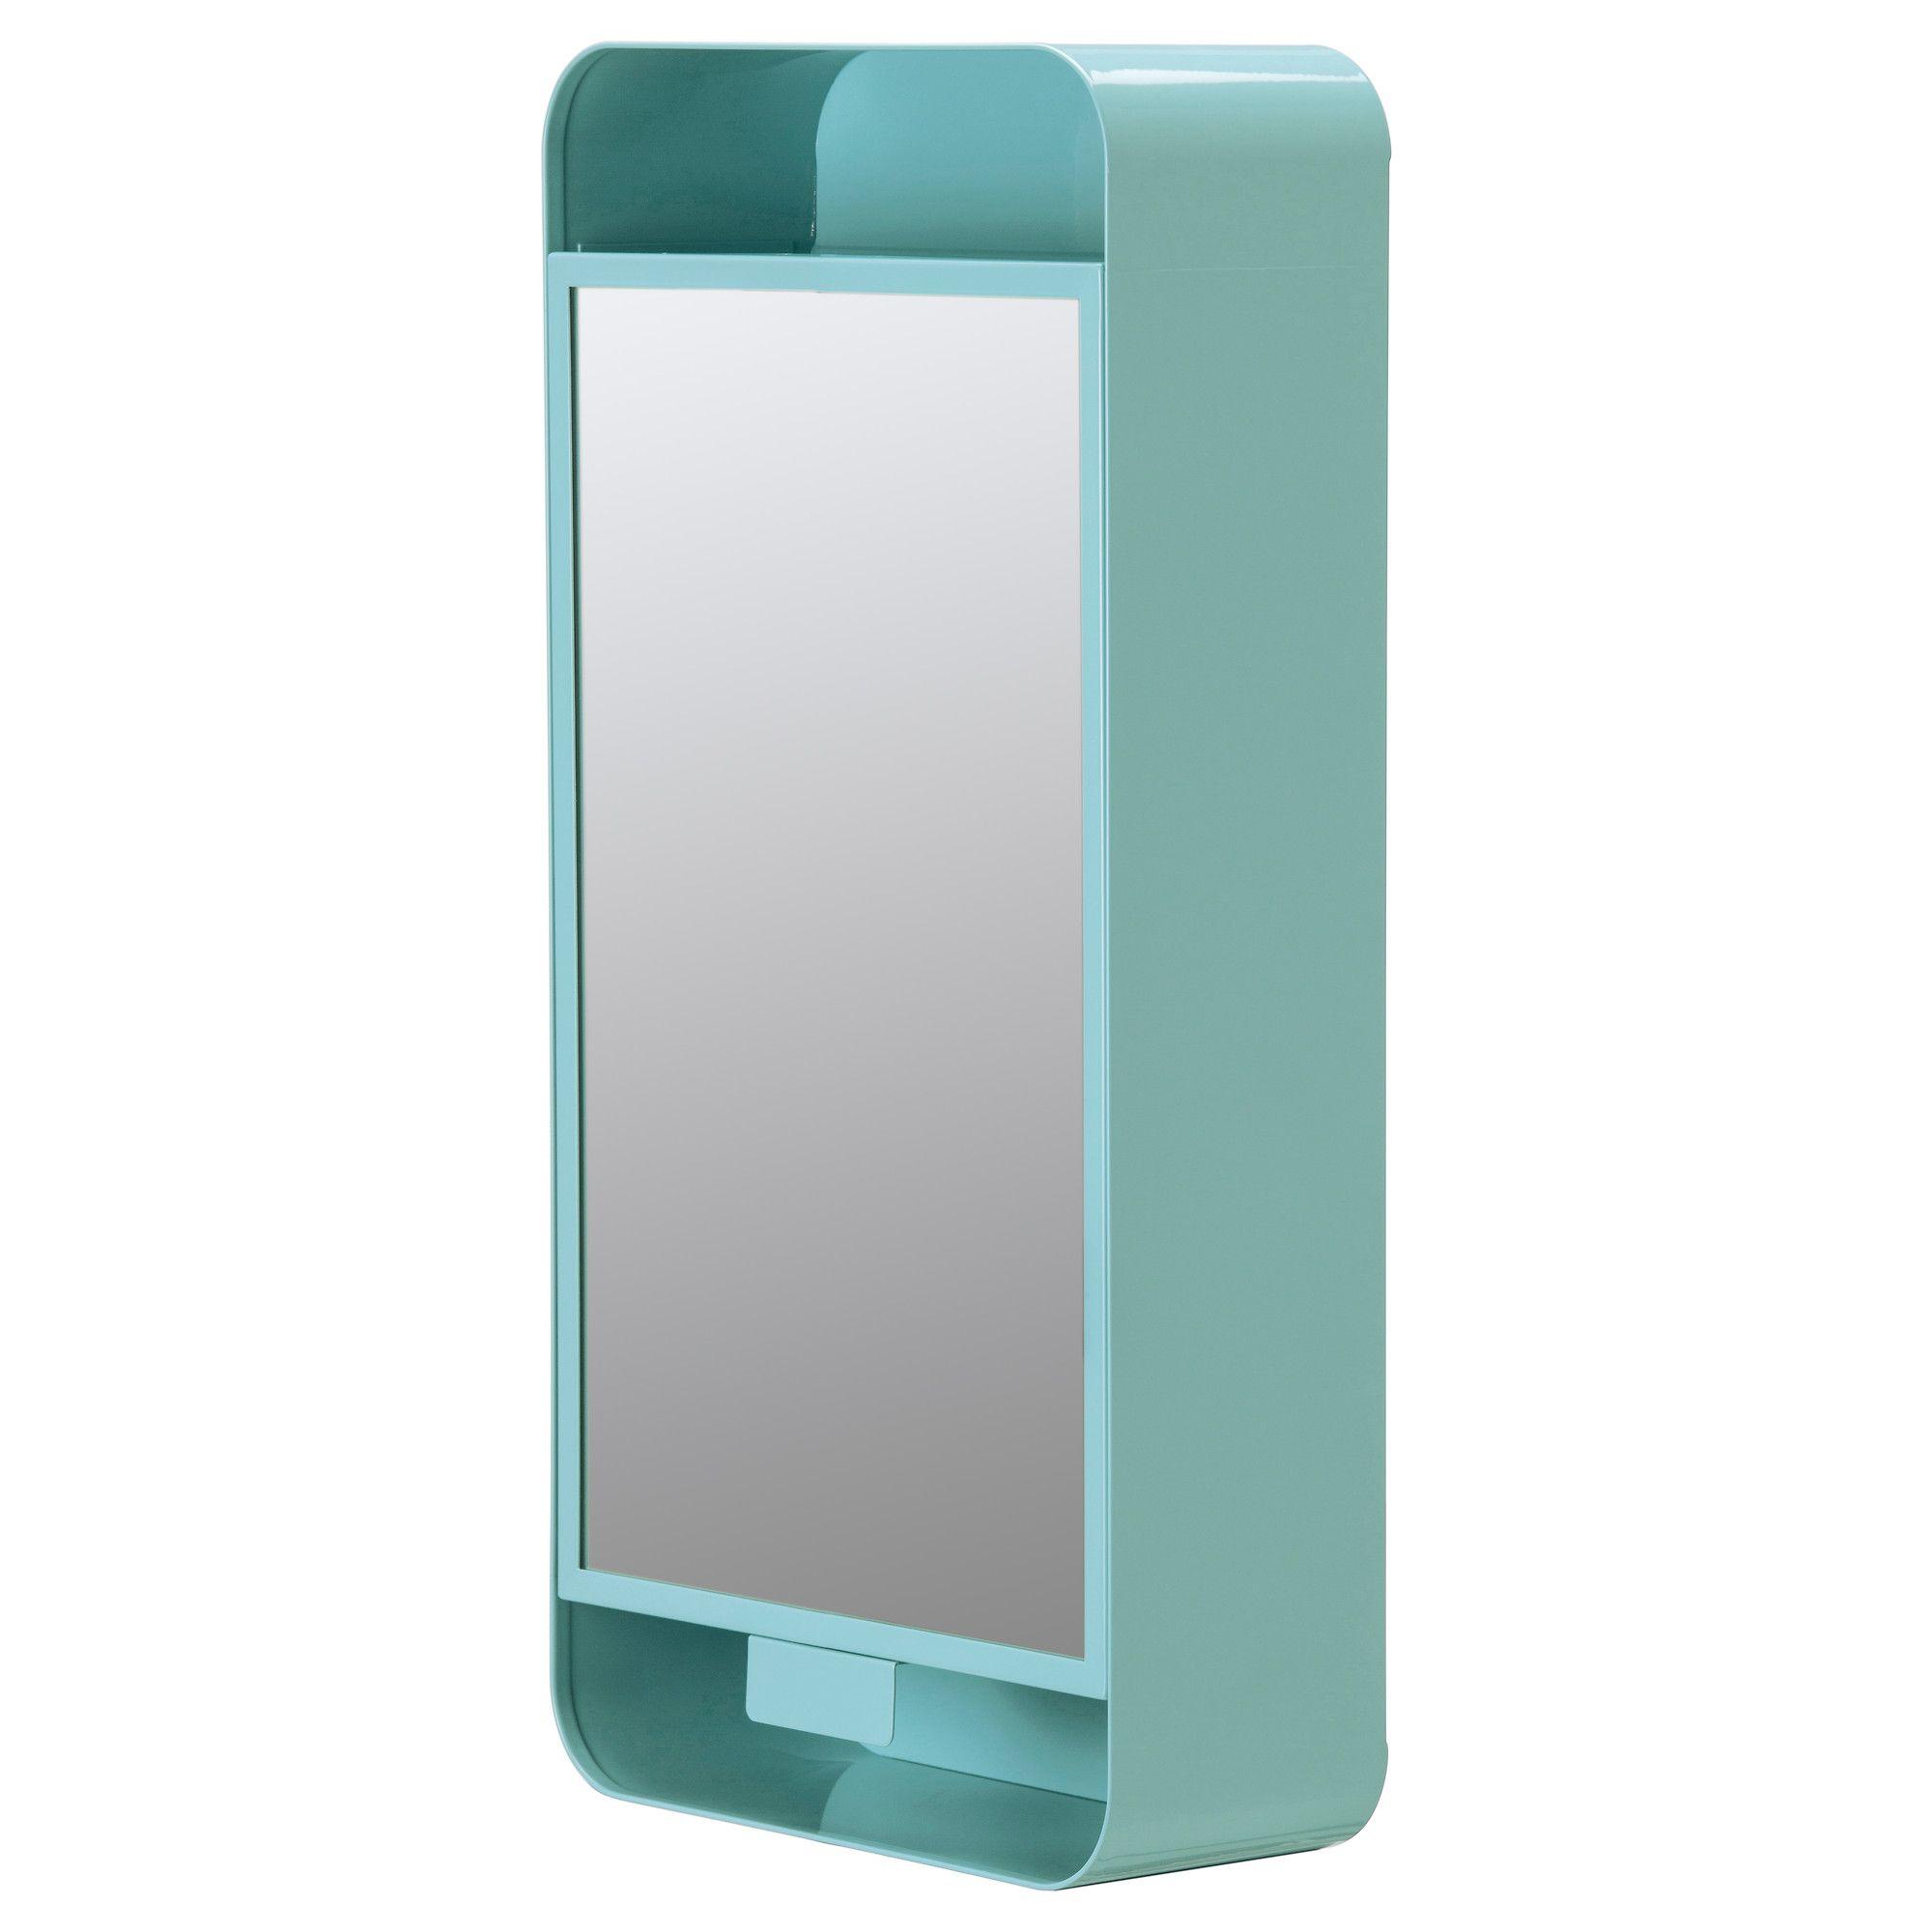 Ikea Us Furniture And Home Furnishings Mirror Cabinets Ikea Mirror Bathroom Mirror Cabinet